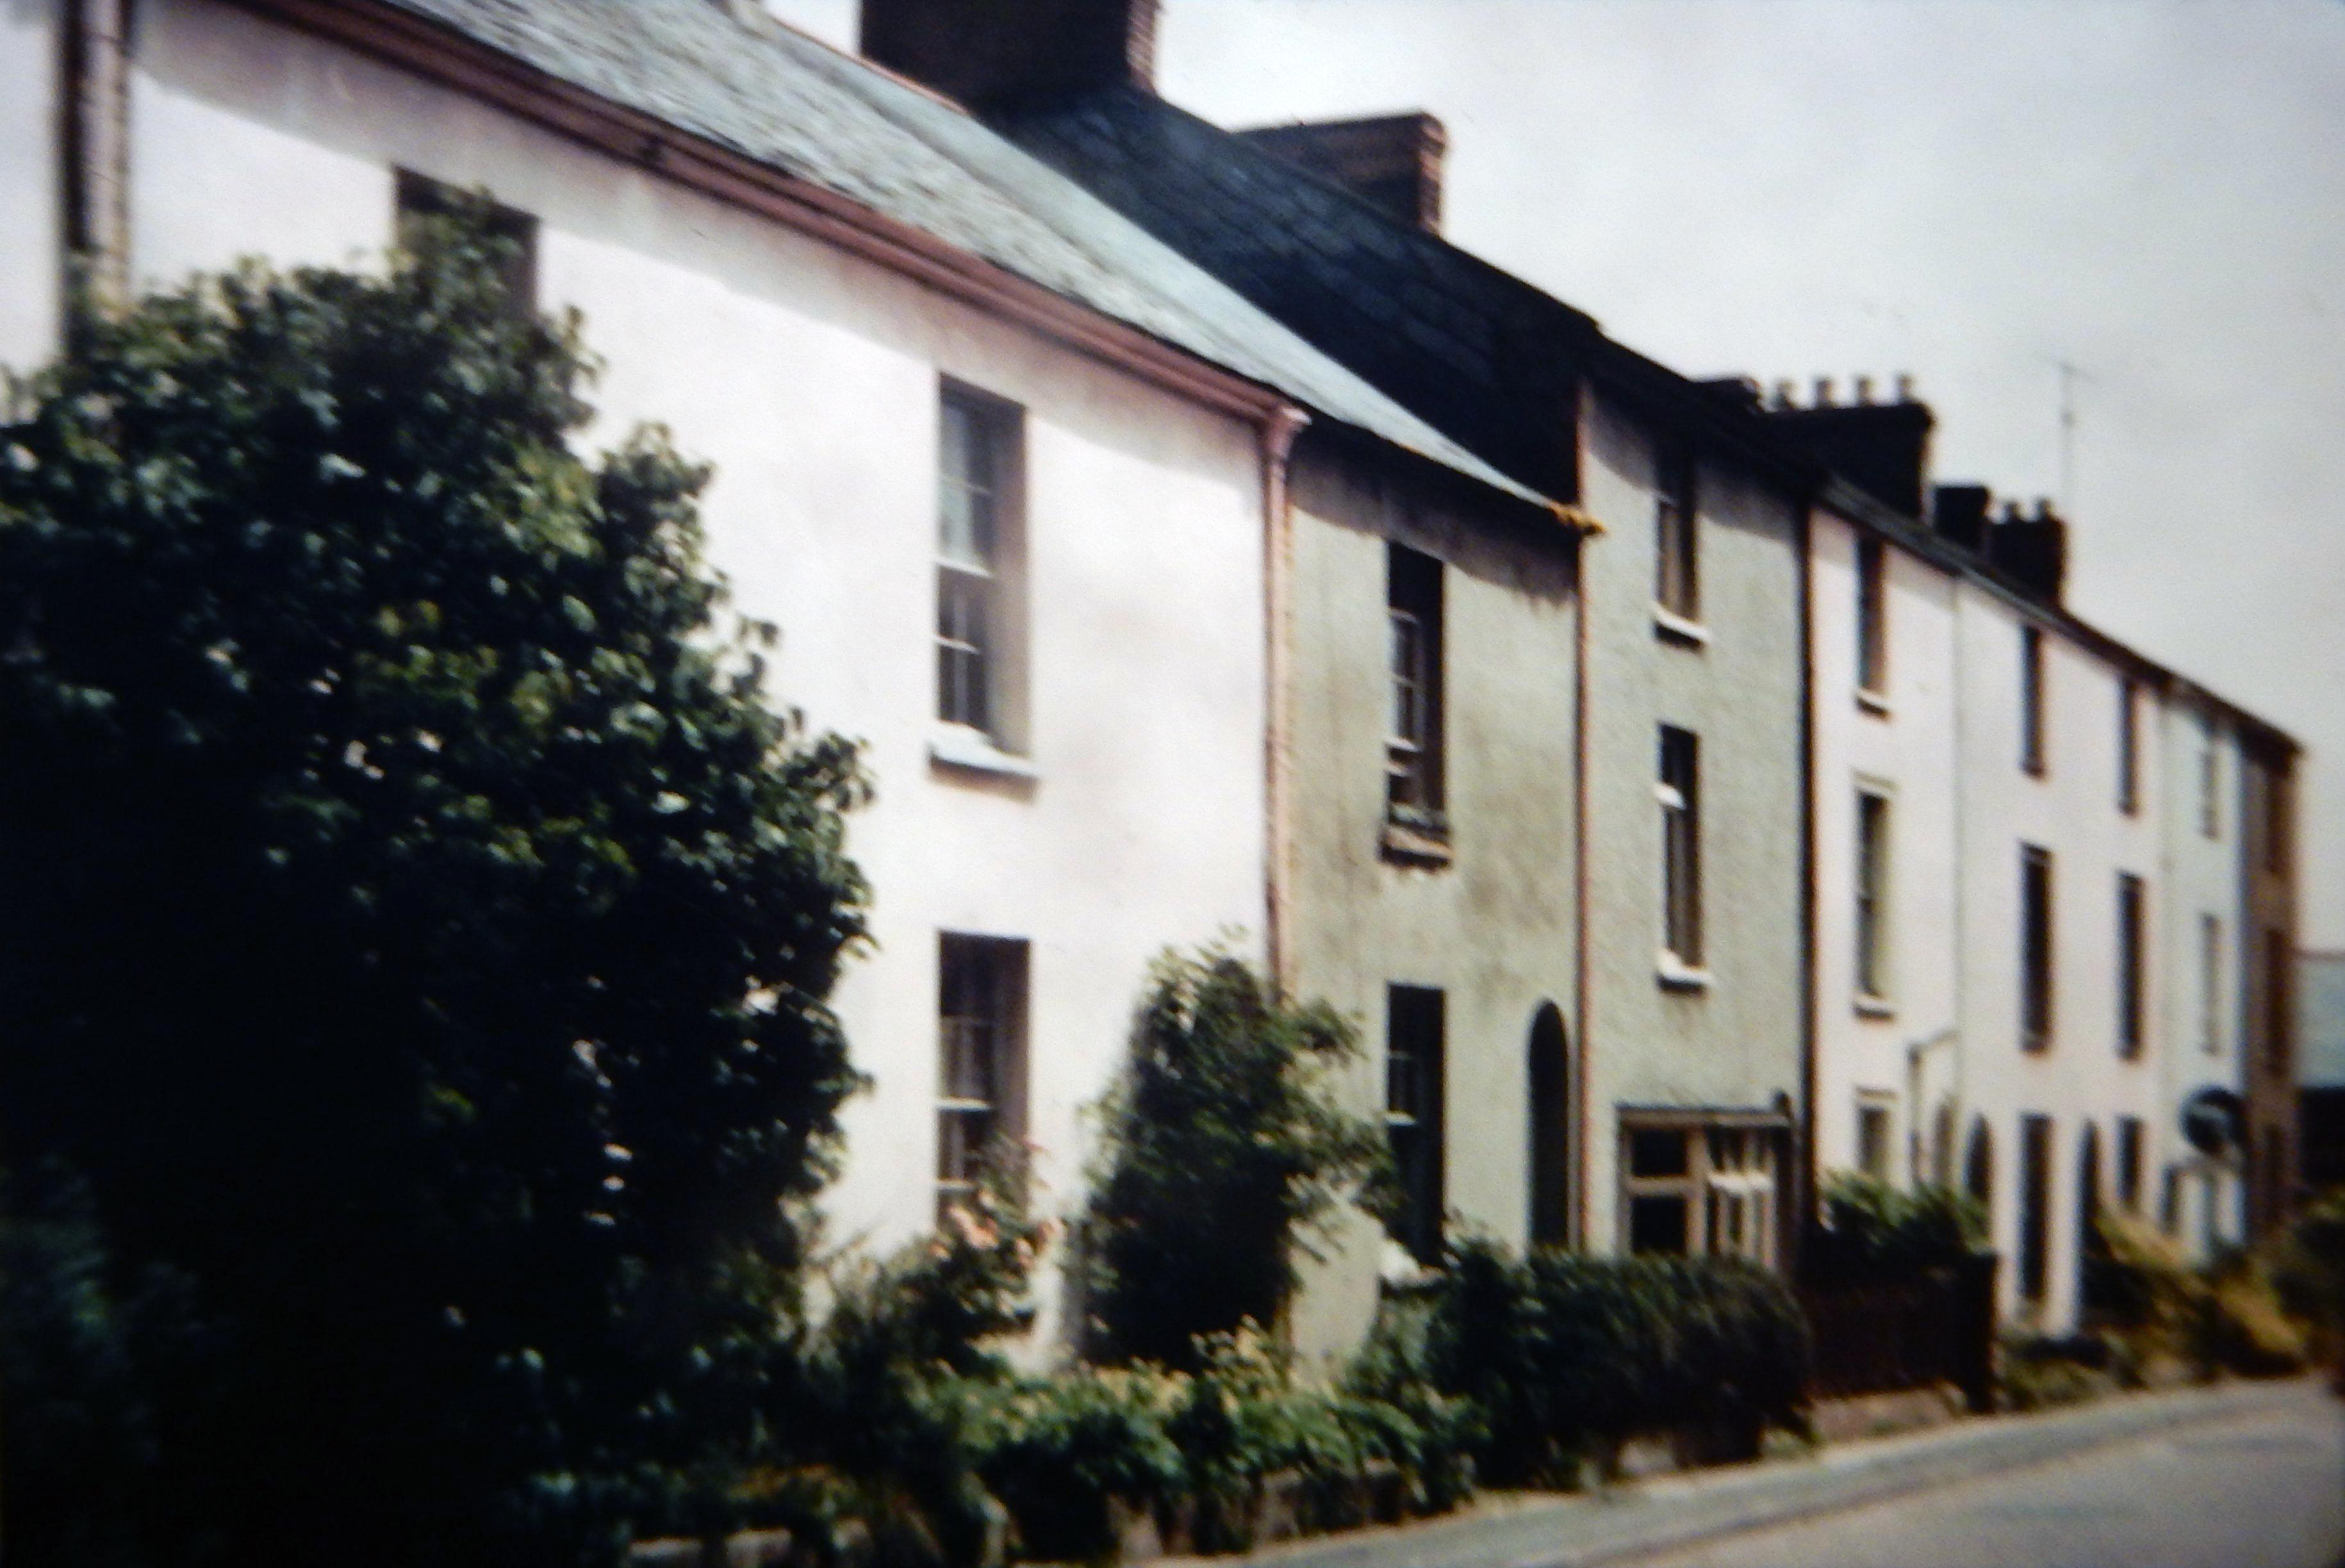 Peter Street 4 - 1970s